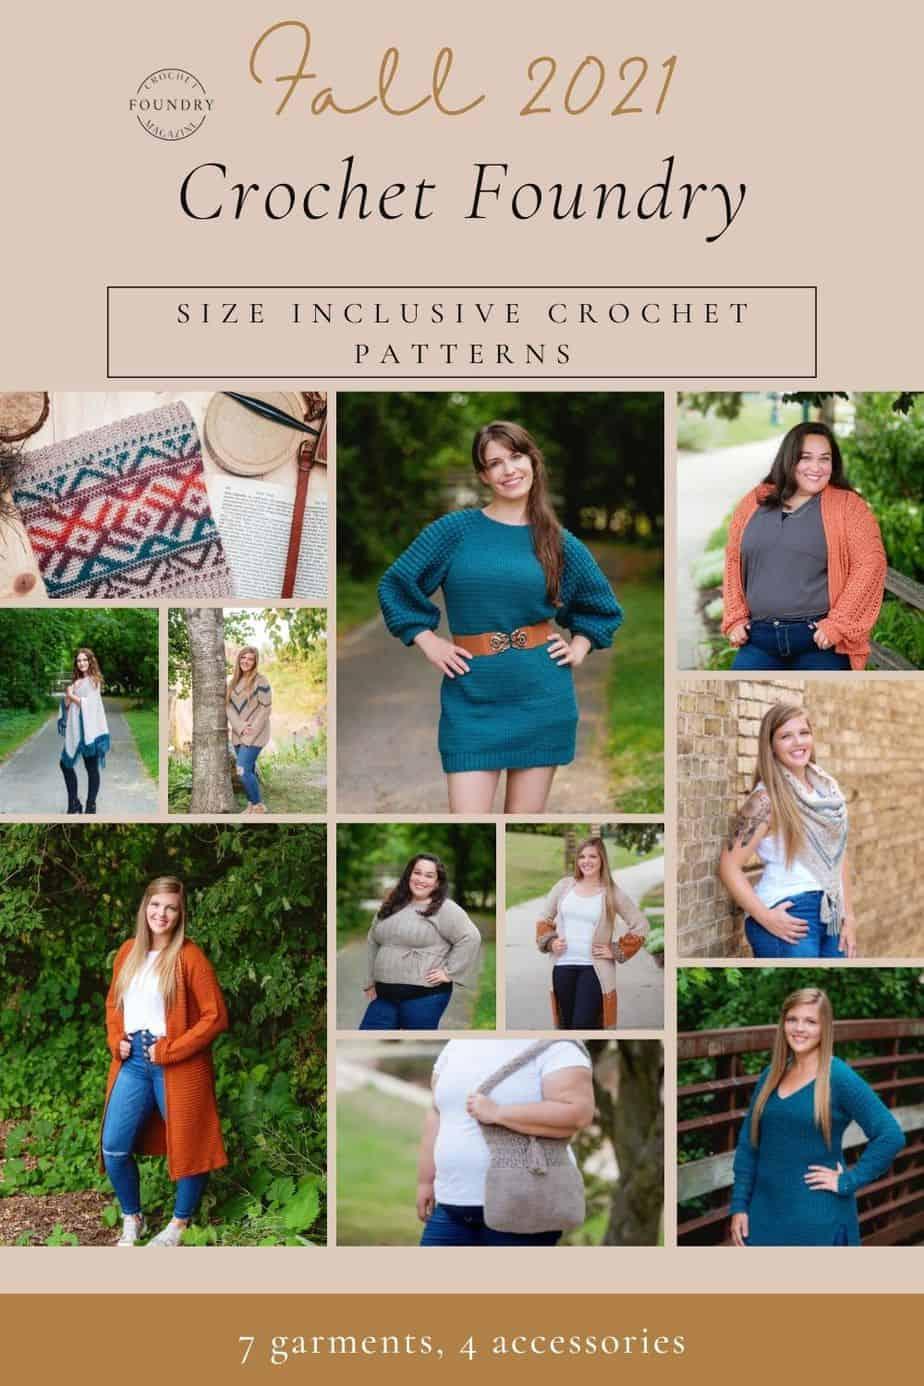 Crochet Foundry Magazine Fall 2021 issue designs